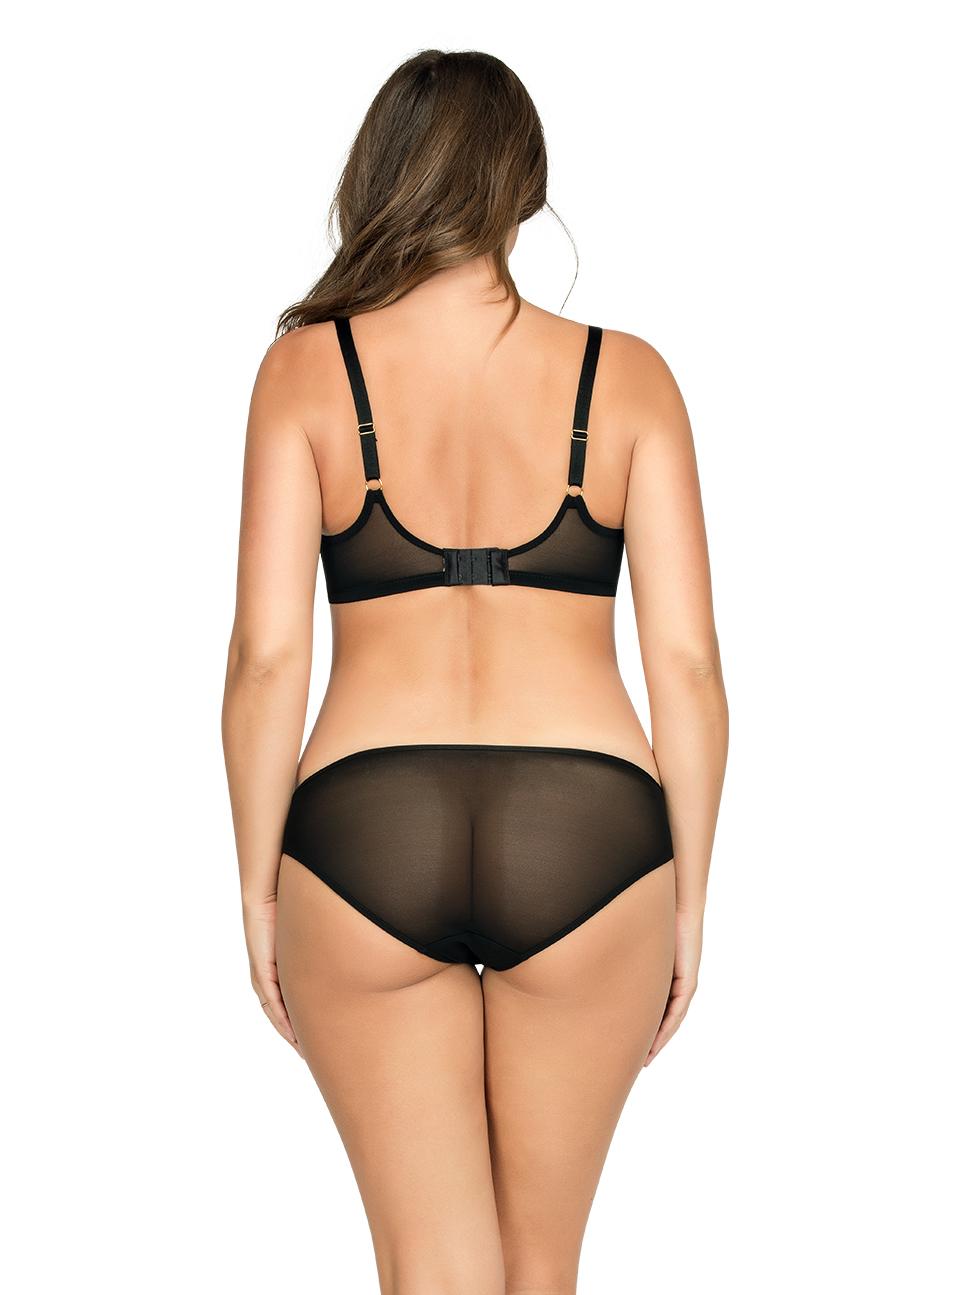 PARFAIT Briana PaddedBraP5671 BikiniP5673 BlackFloral Back - Briana Padded Bra Black Floral P5671